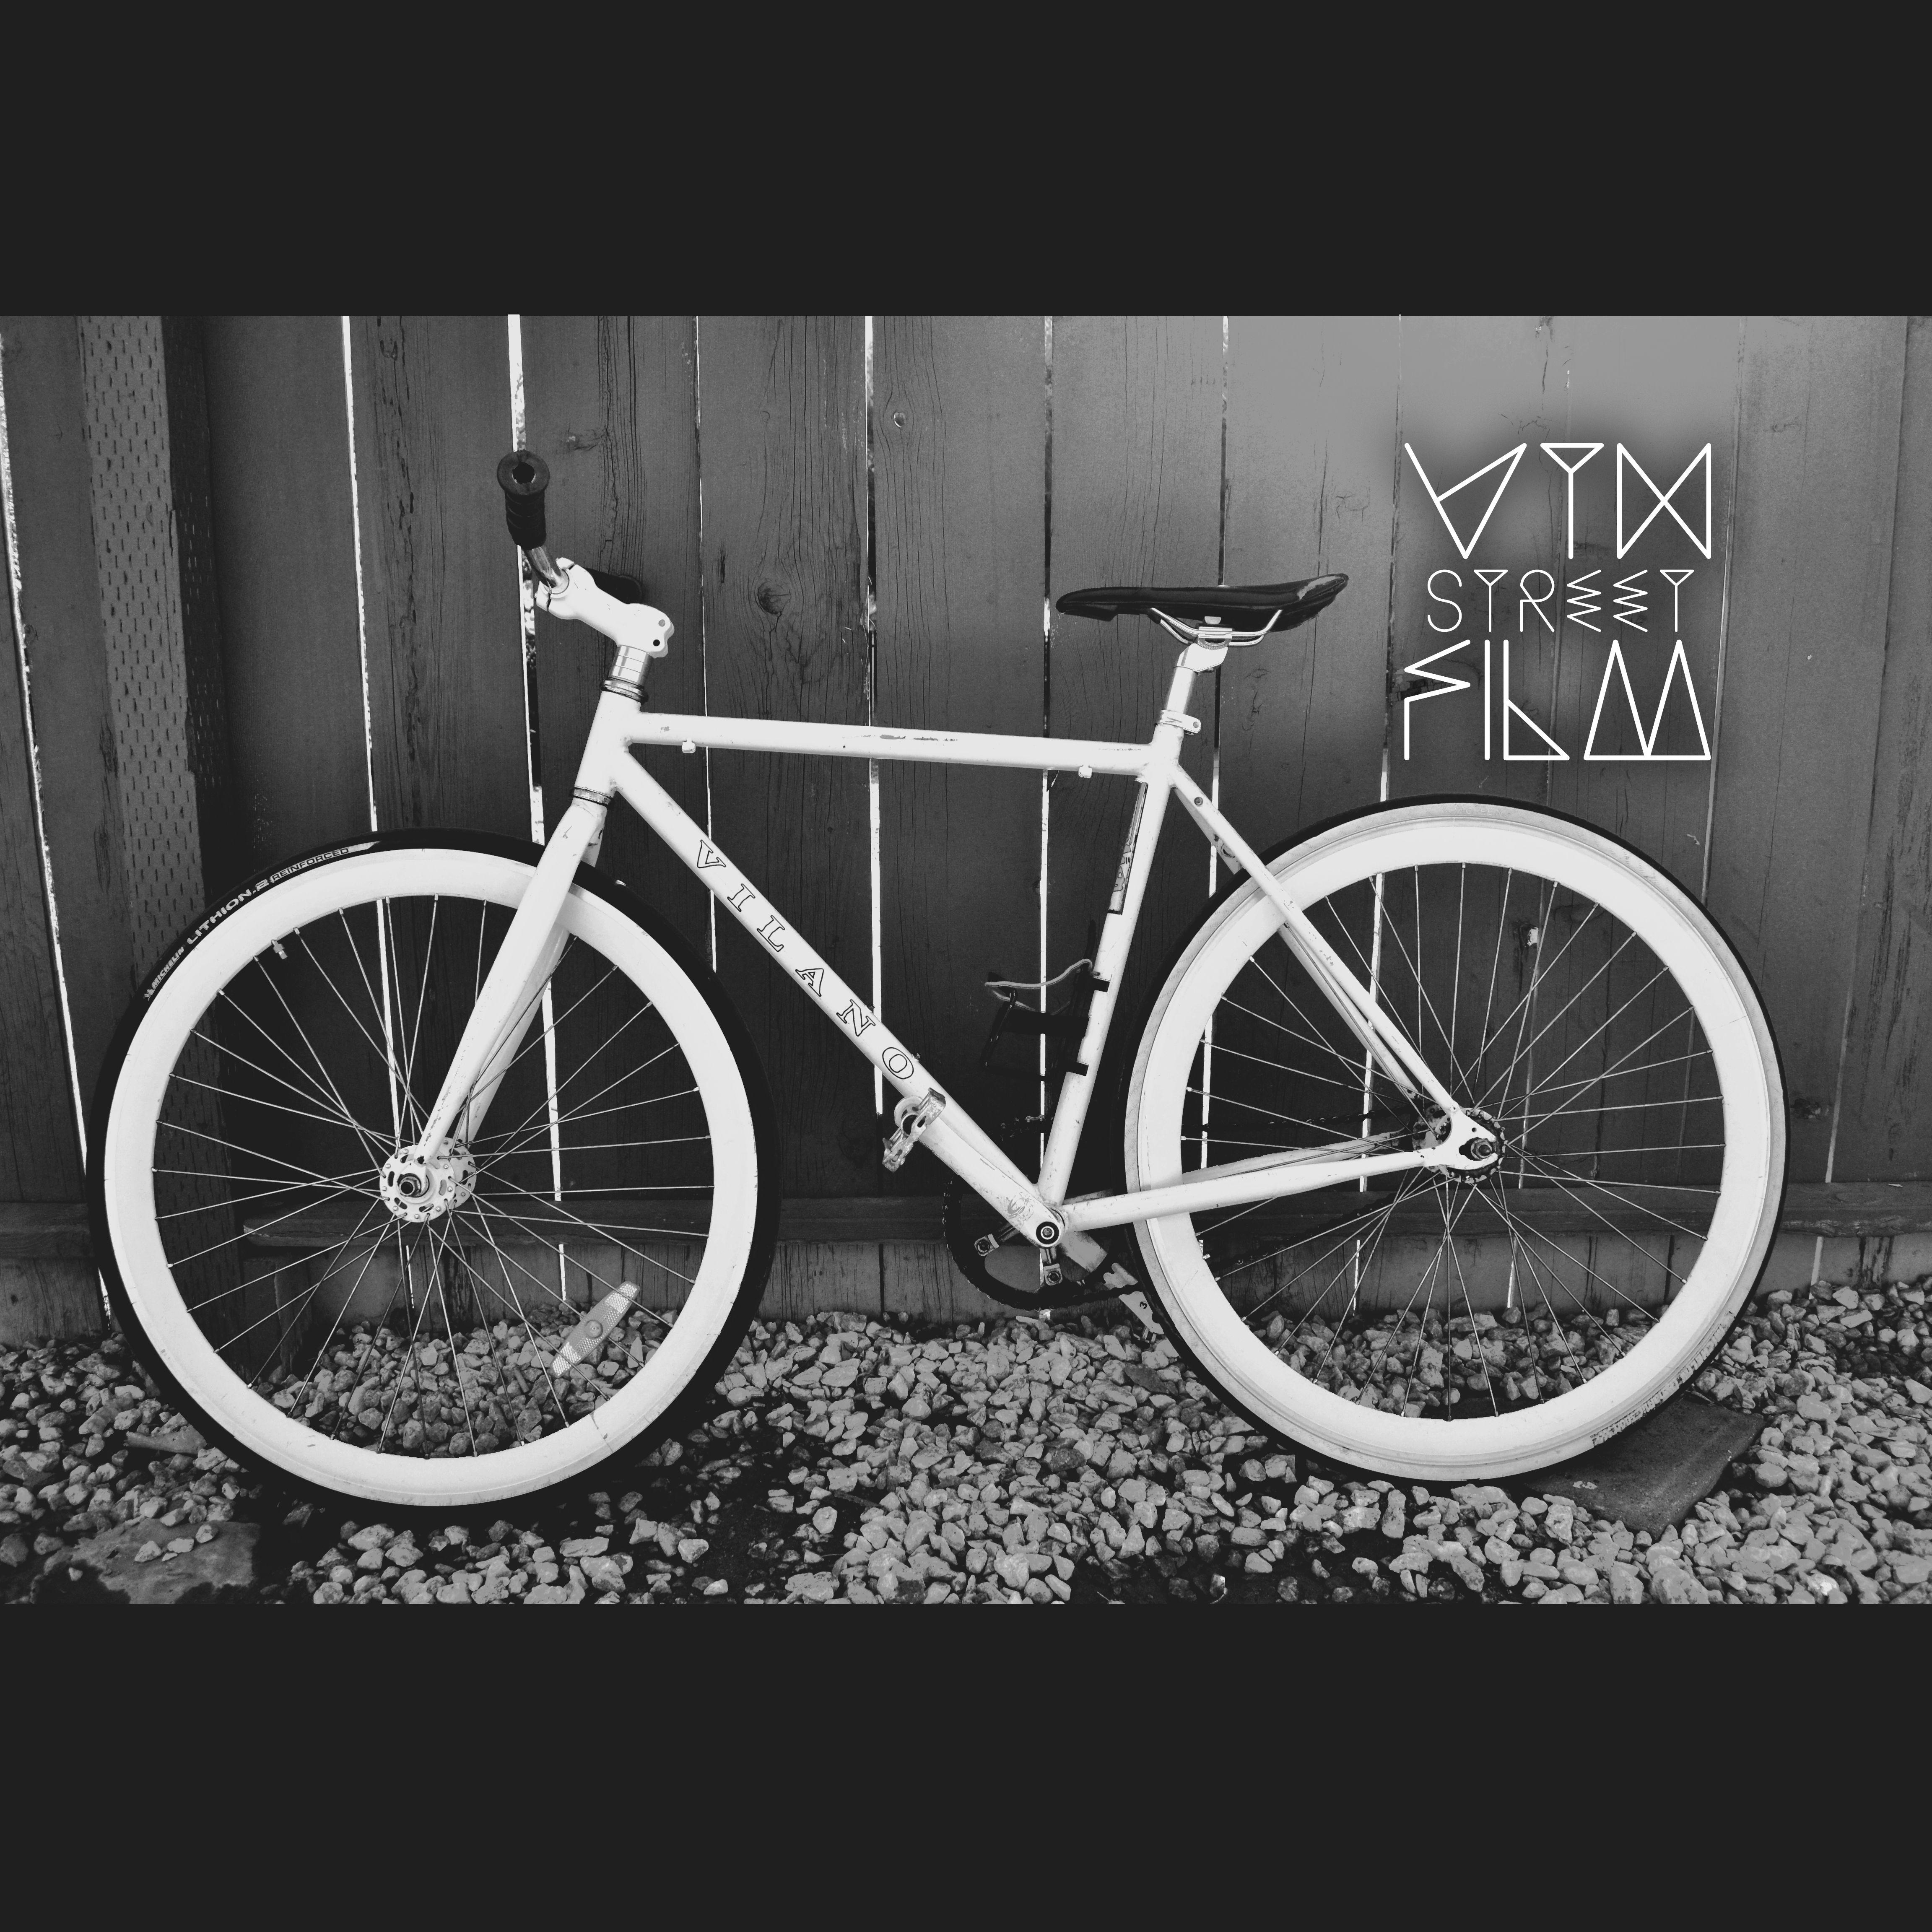 Vilano Single Speed Bike With Images Single Speed Bike Bike Pics